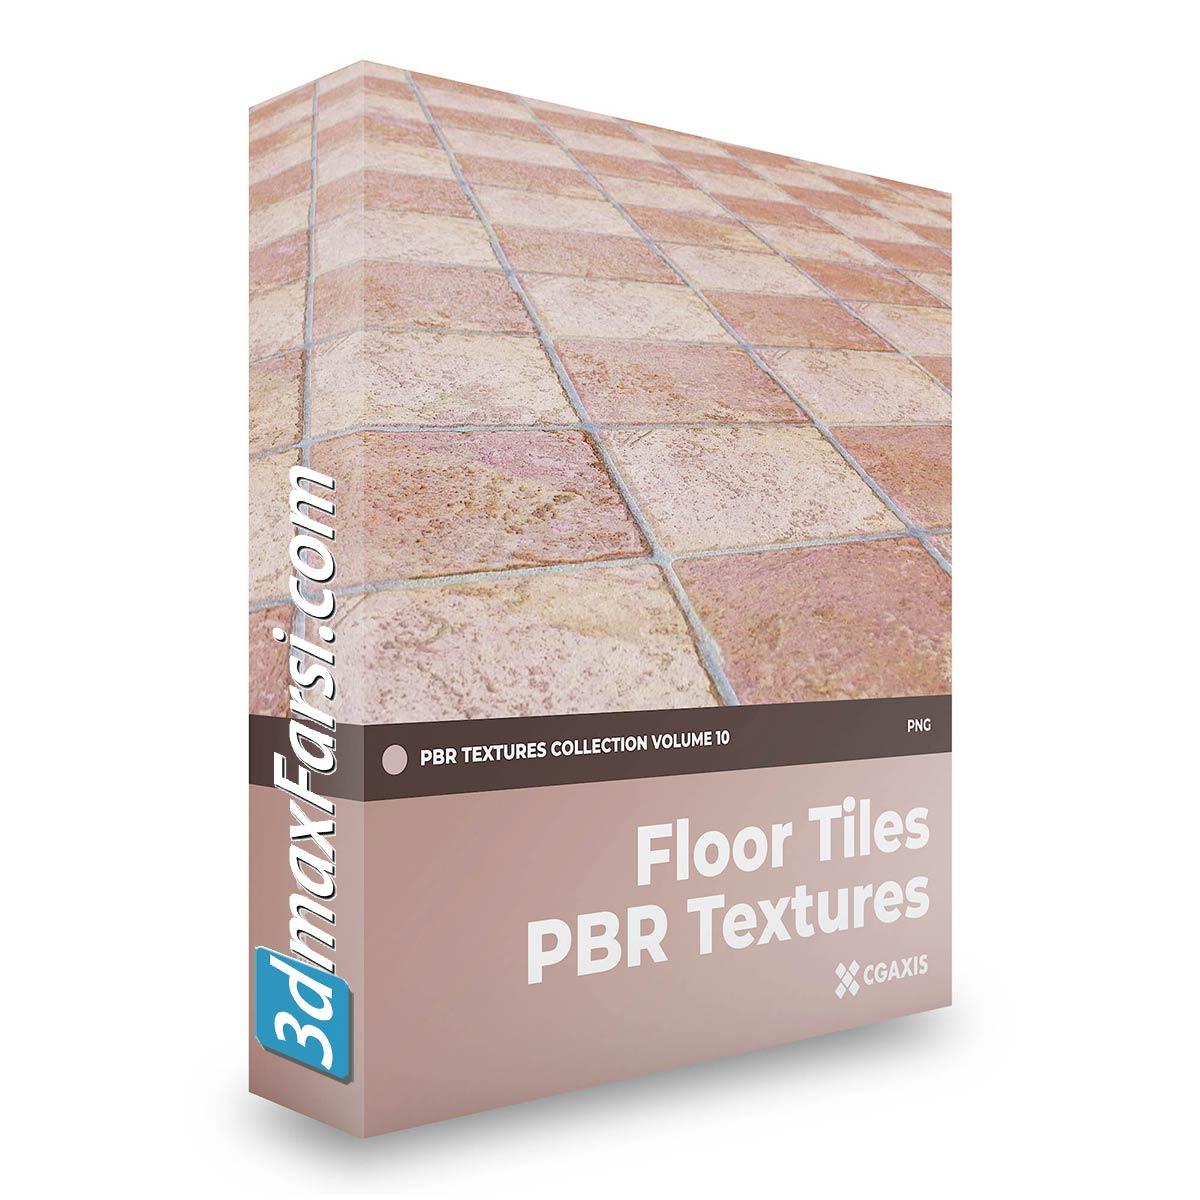 Download CGAxis Floor Tiles PBR Textures – Collection Volume 10